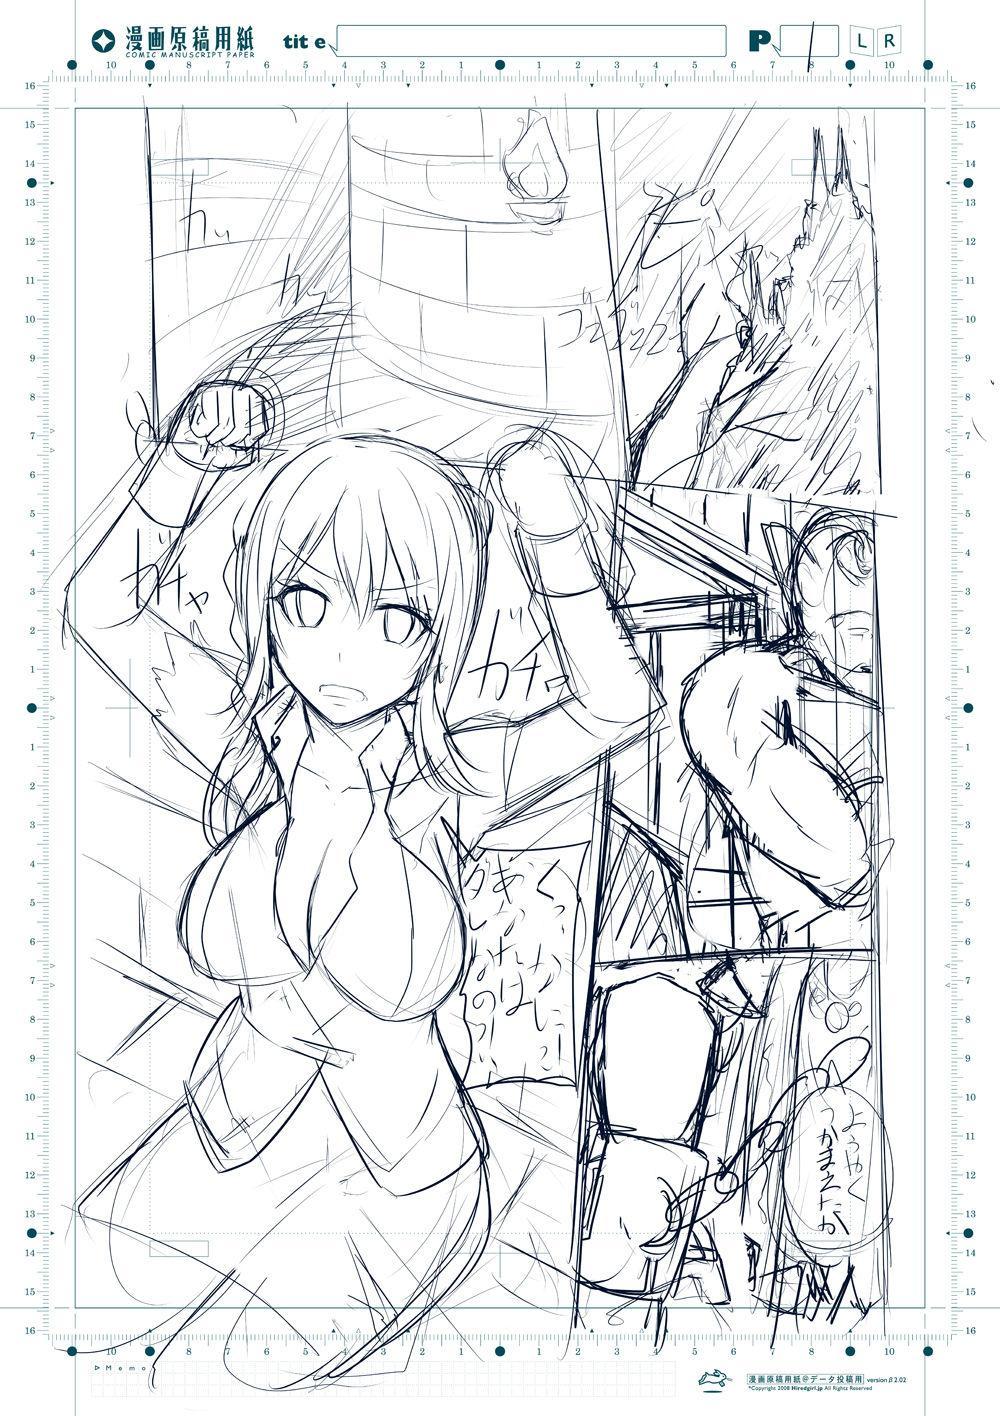 Goblin Slayer Sennou Manga 14